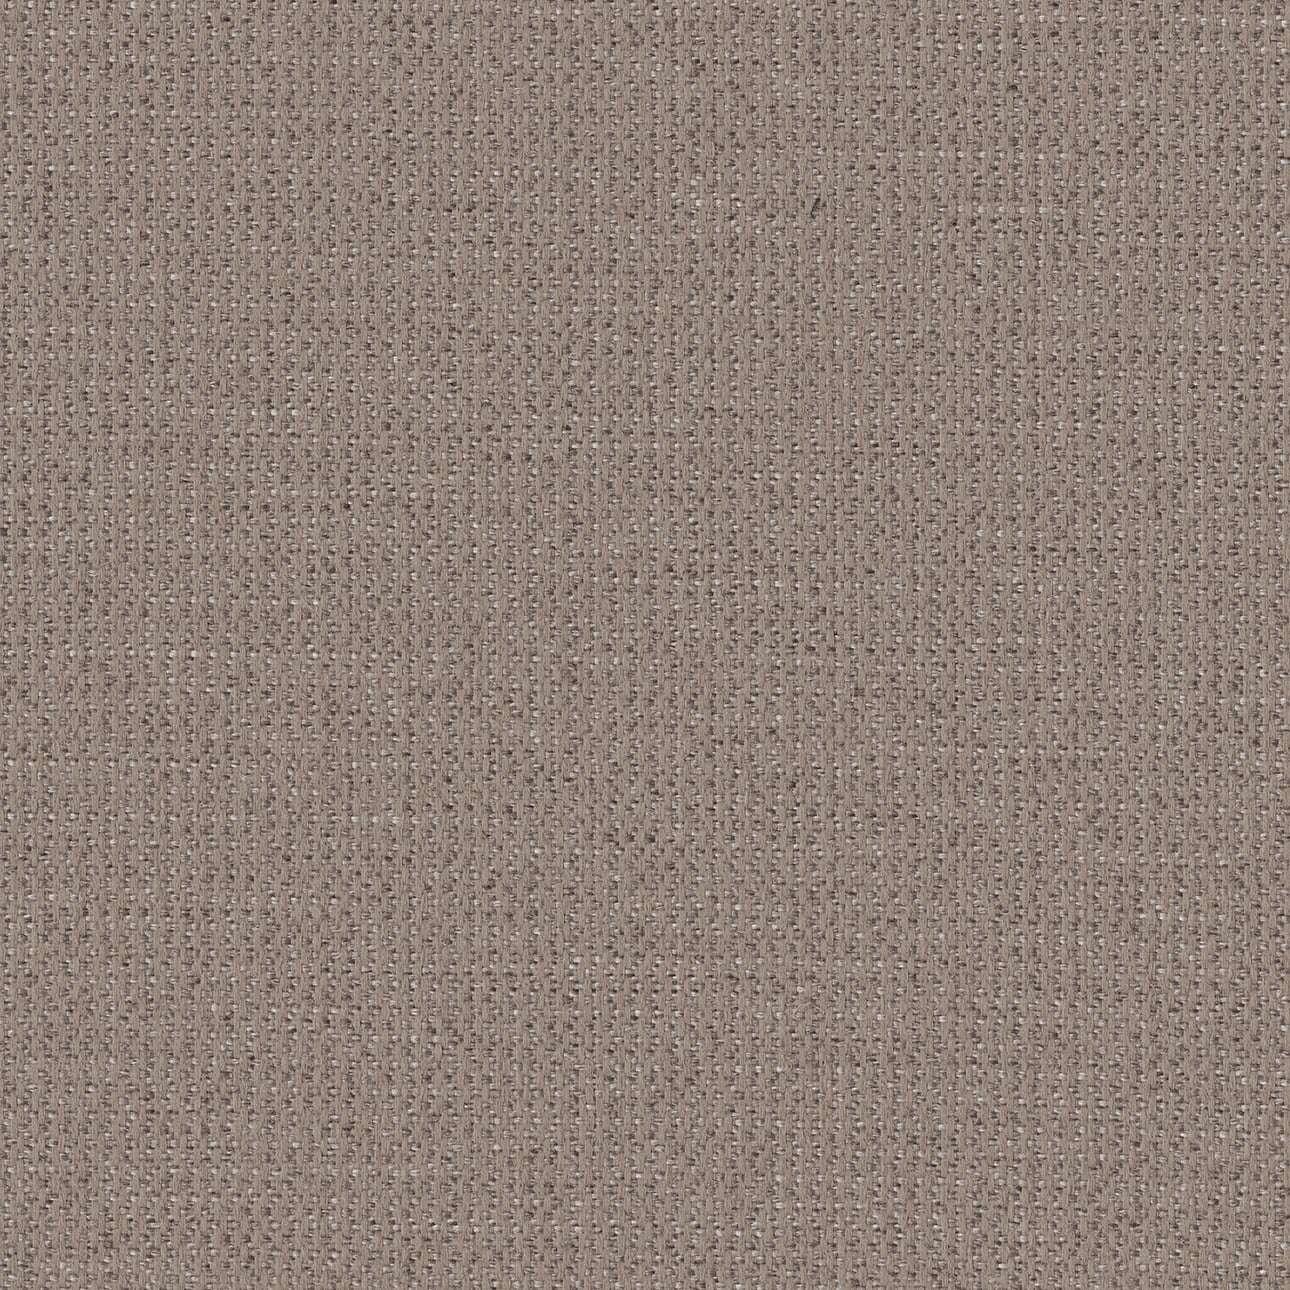 Potah na křeslo Barkaby v kolekci Living, látka: 160-16